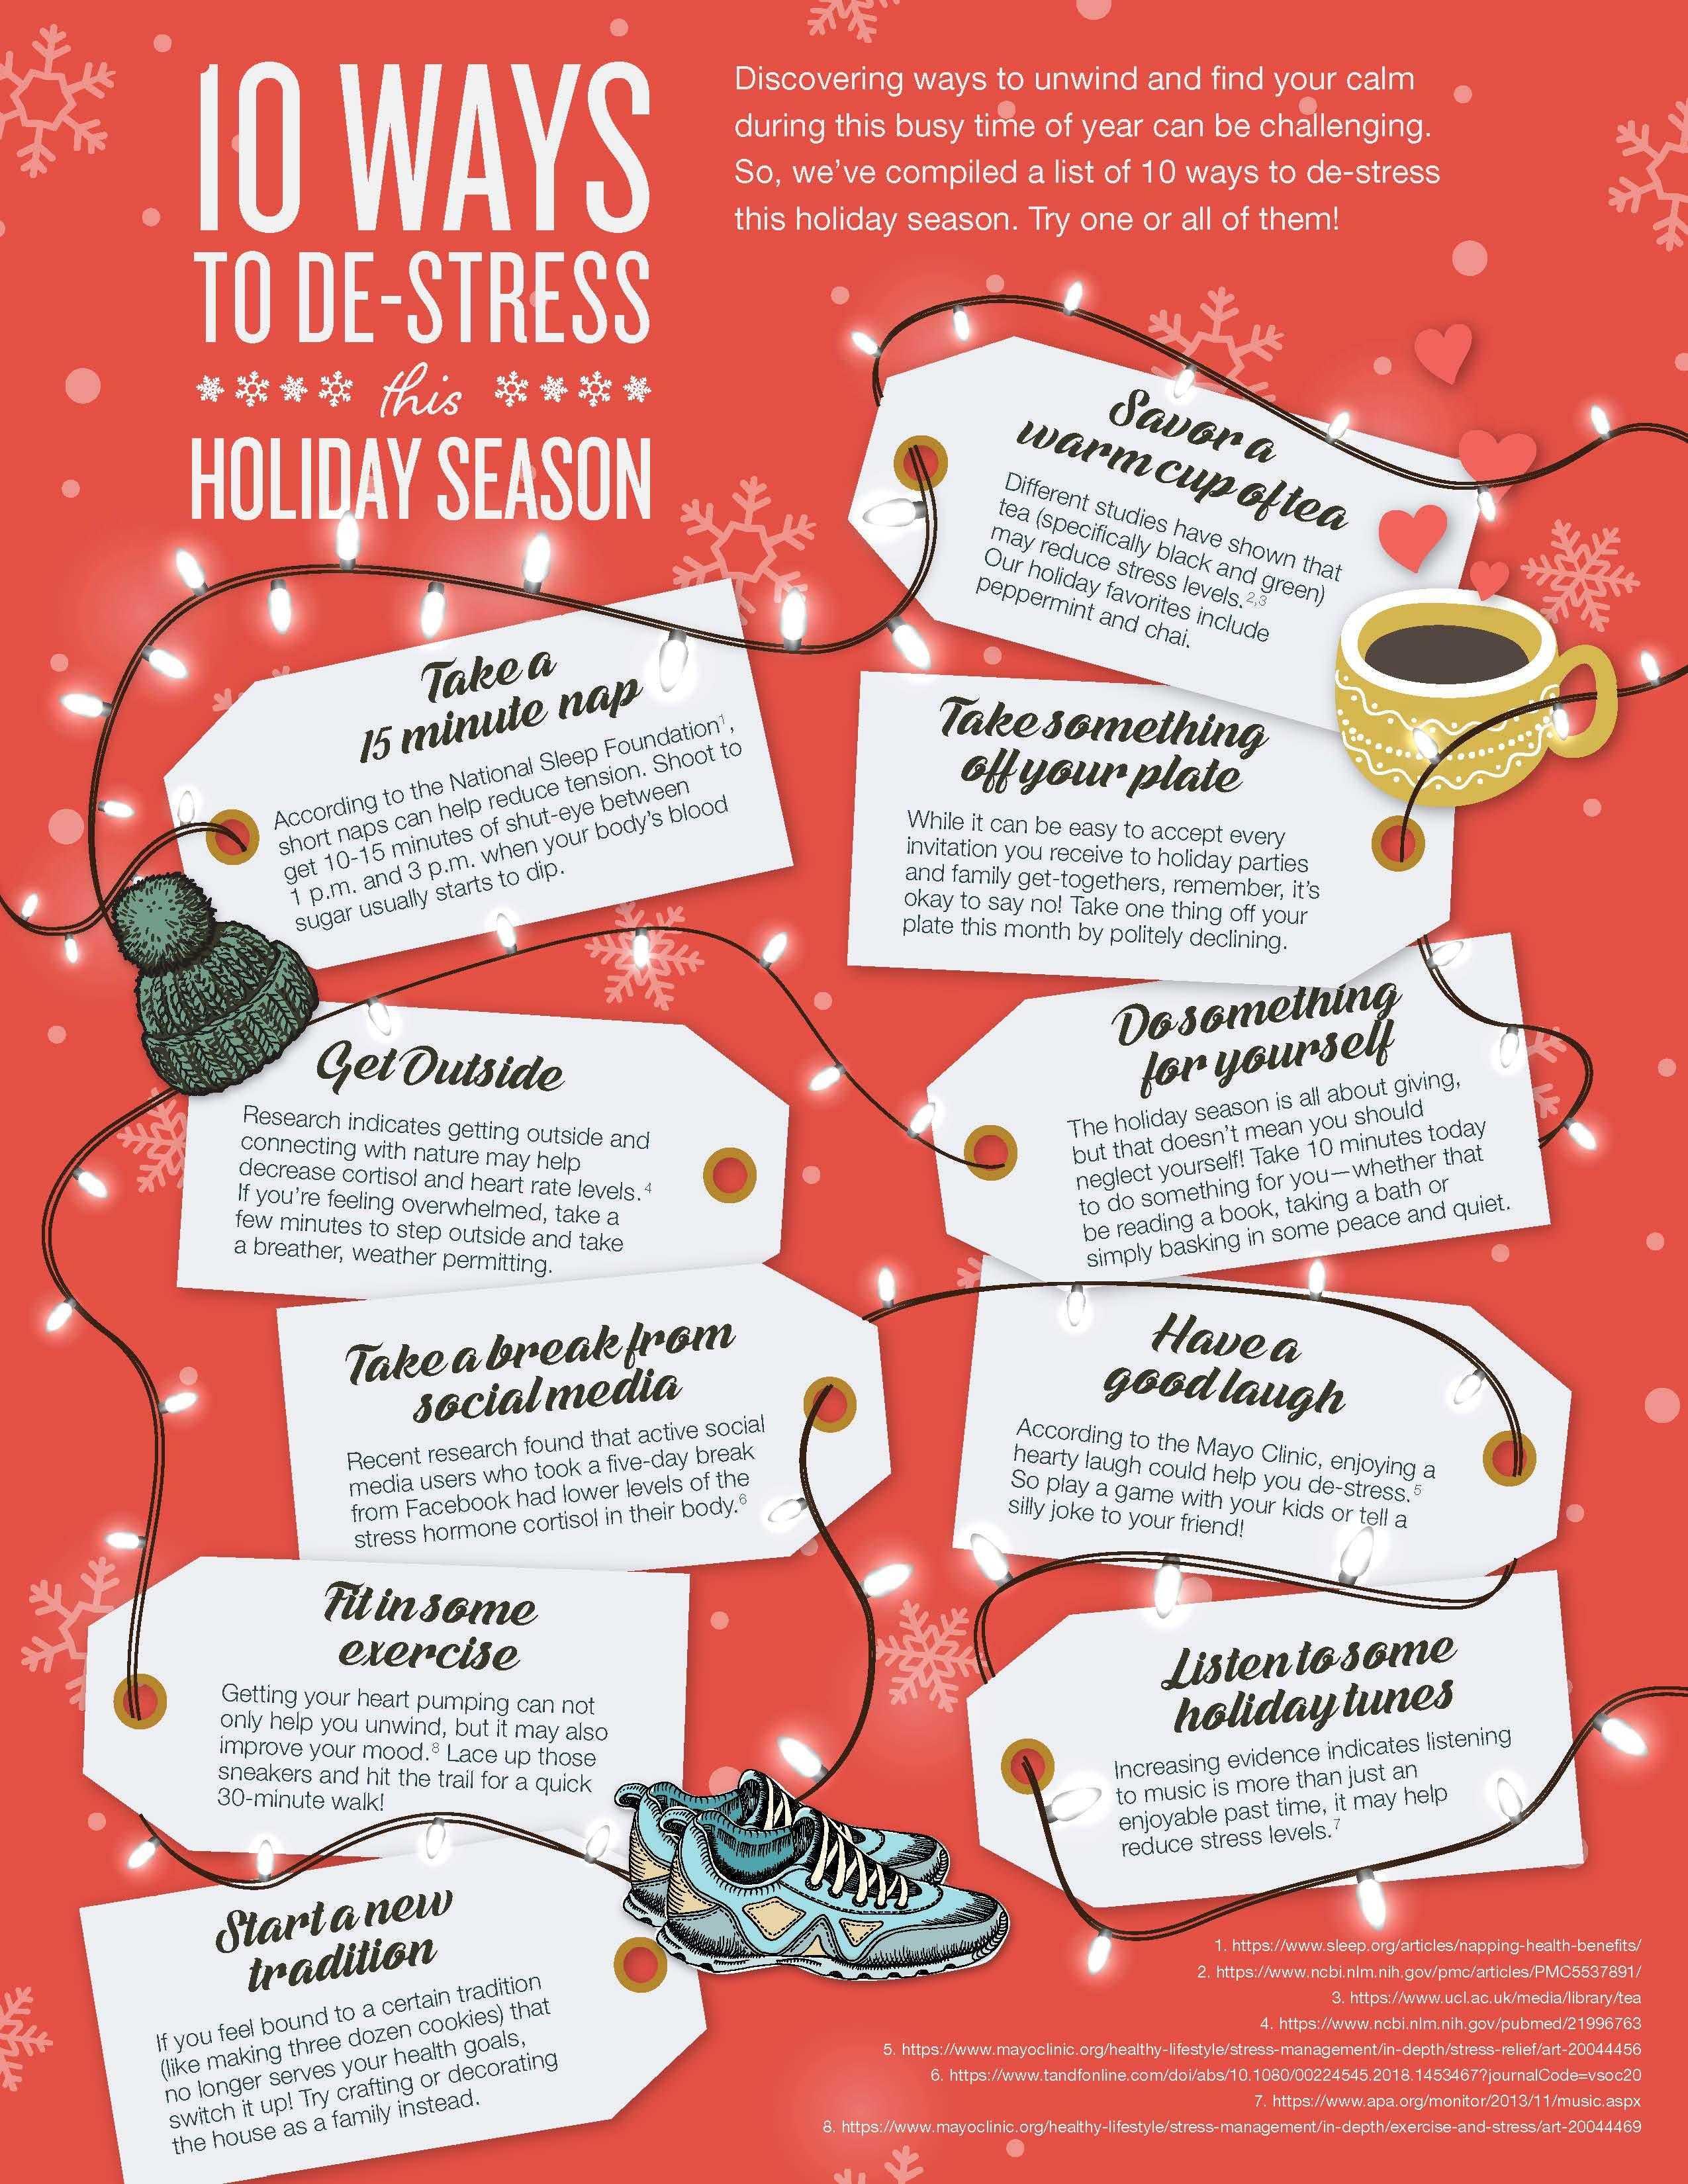 10 Ways To De-Stress Holidays